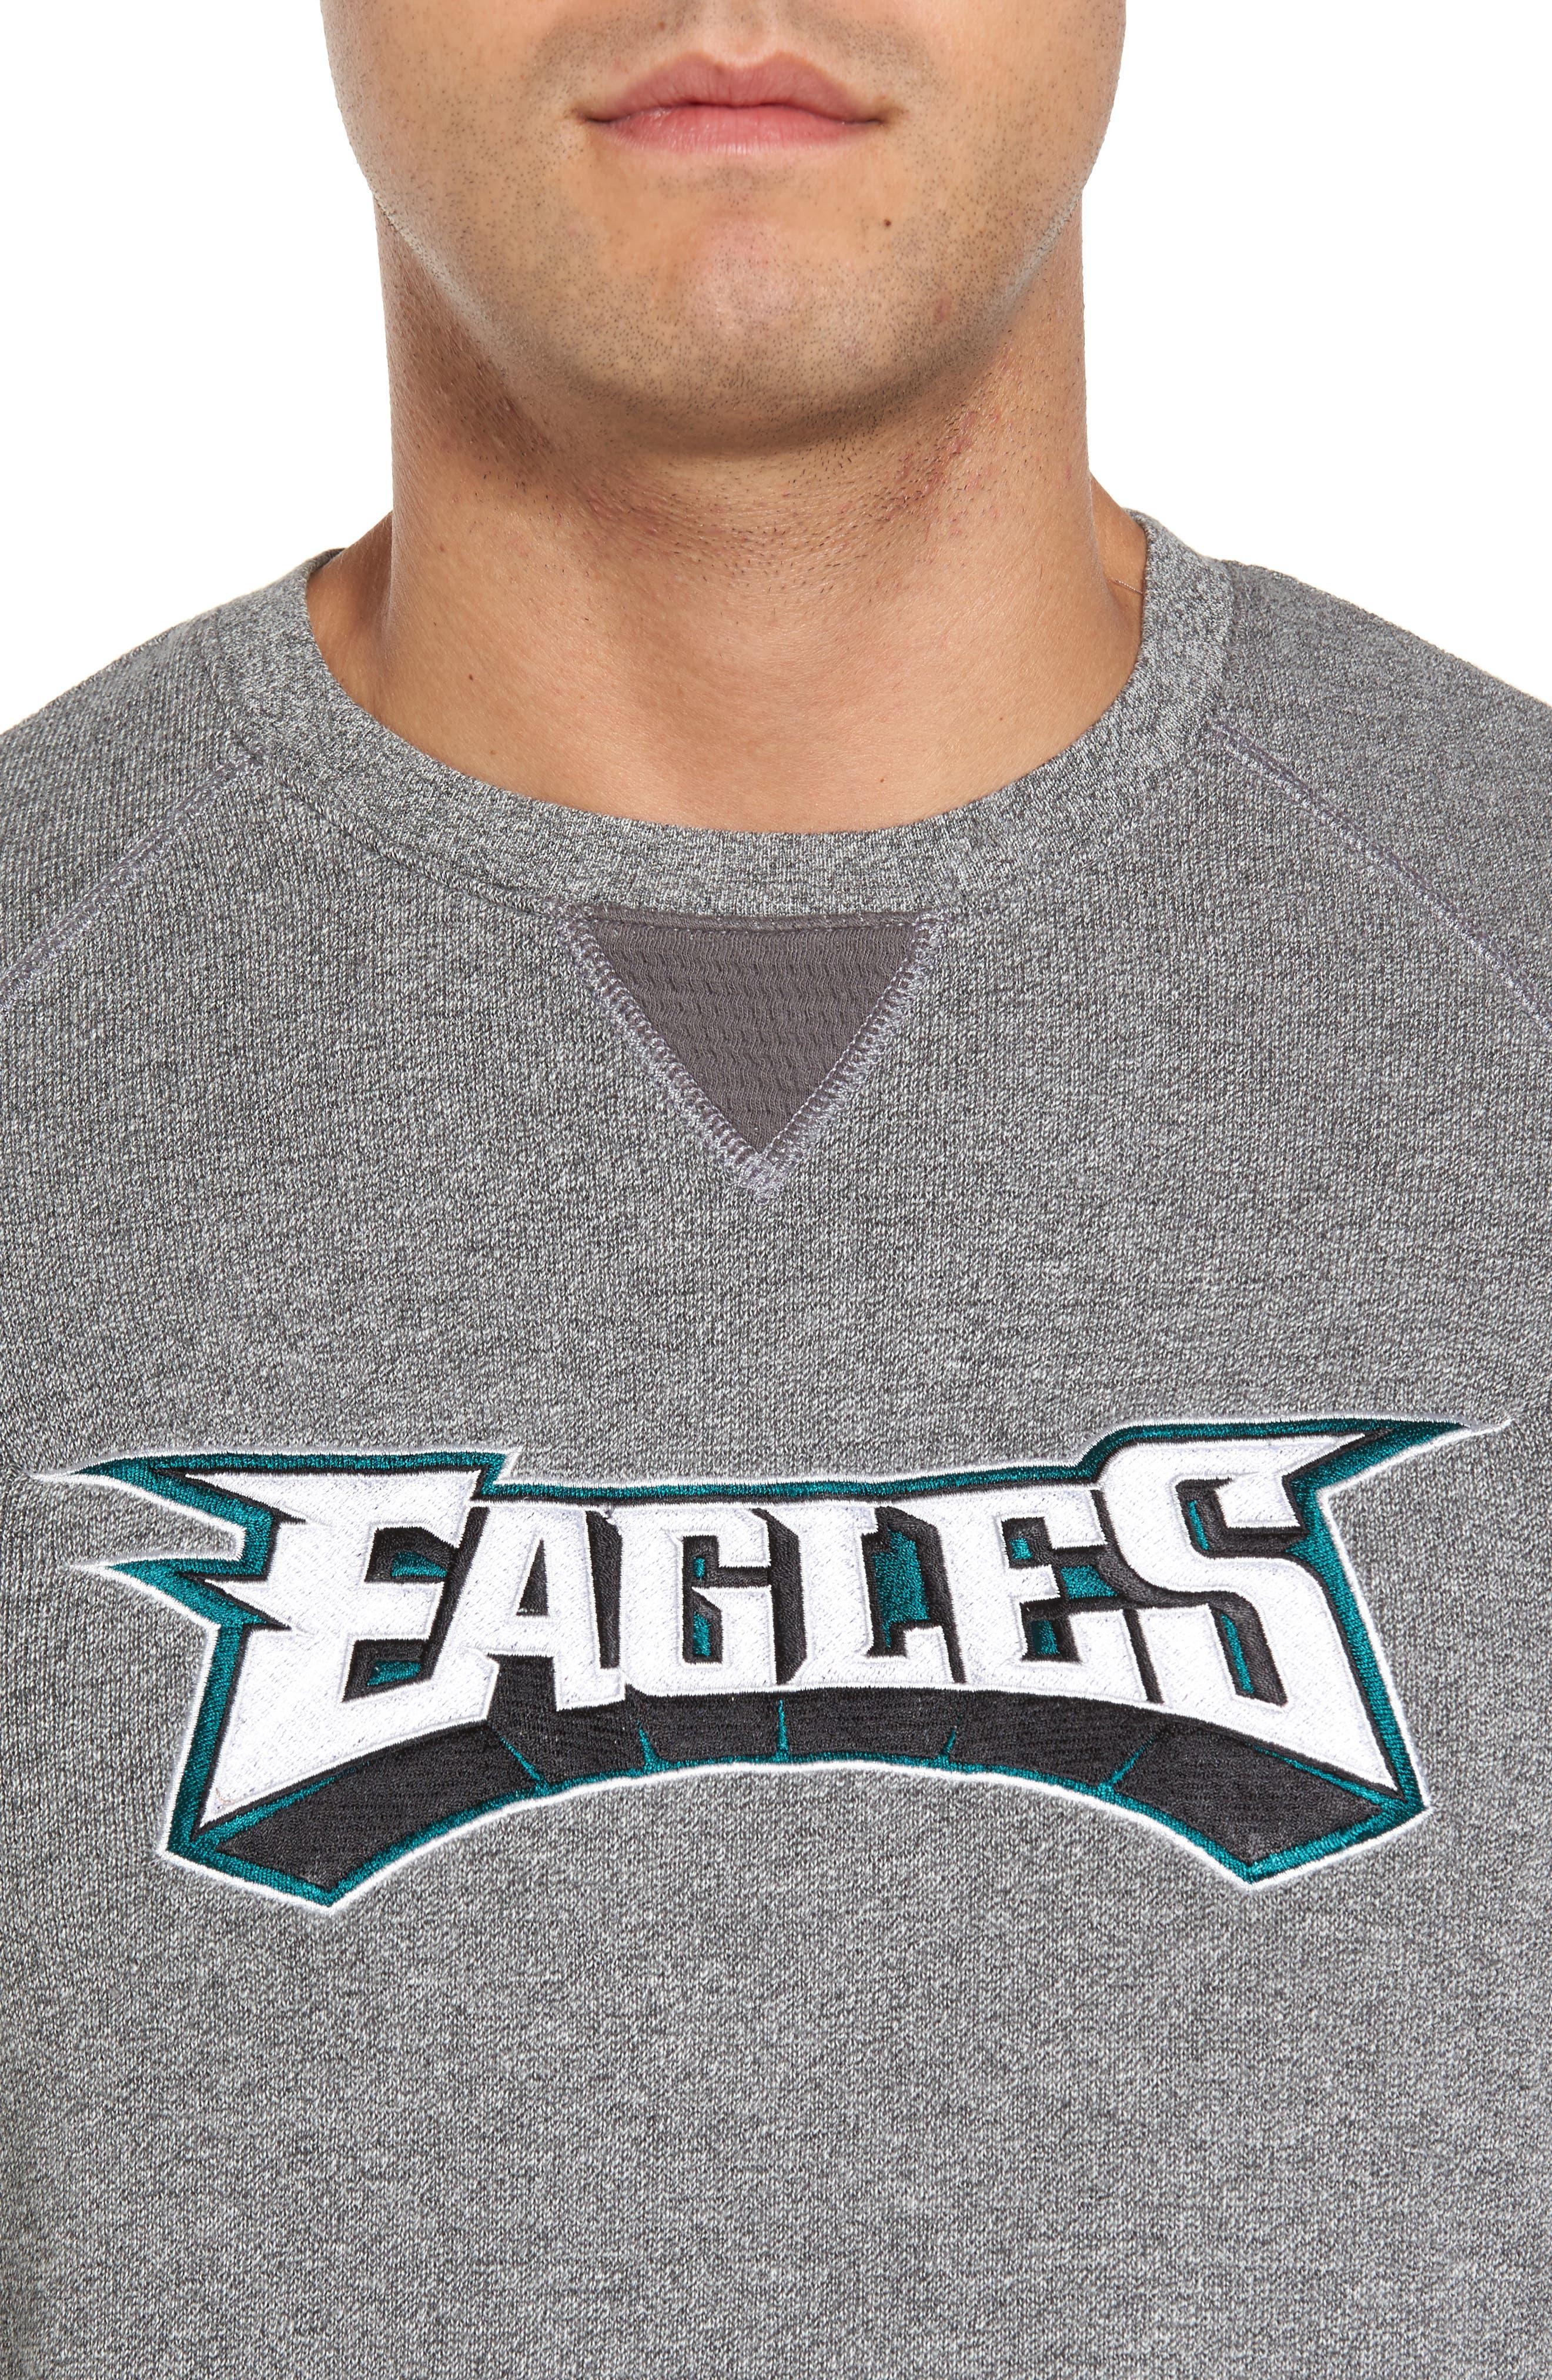 NFL Stitch of Liberty Embroidered Crewneck Sweatshirt,                             Alternate thumbnail 106, color,